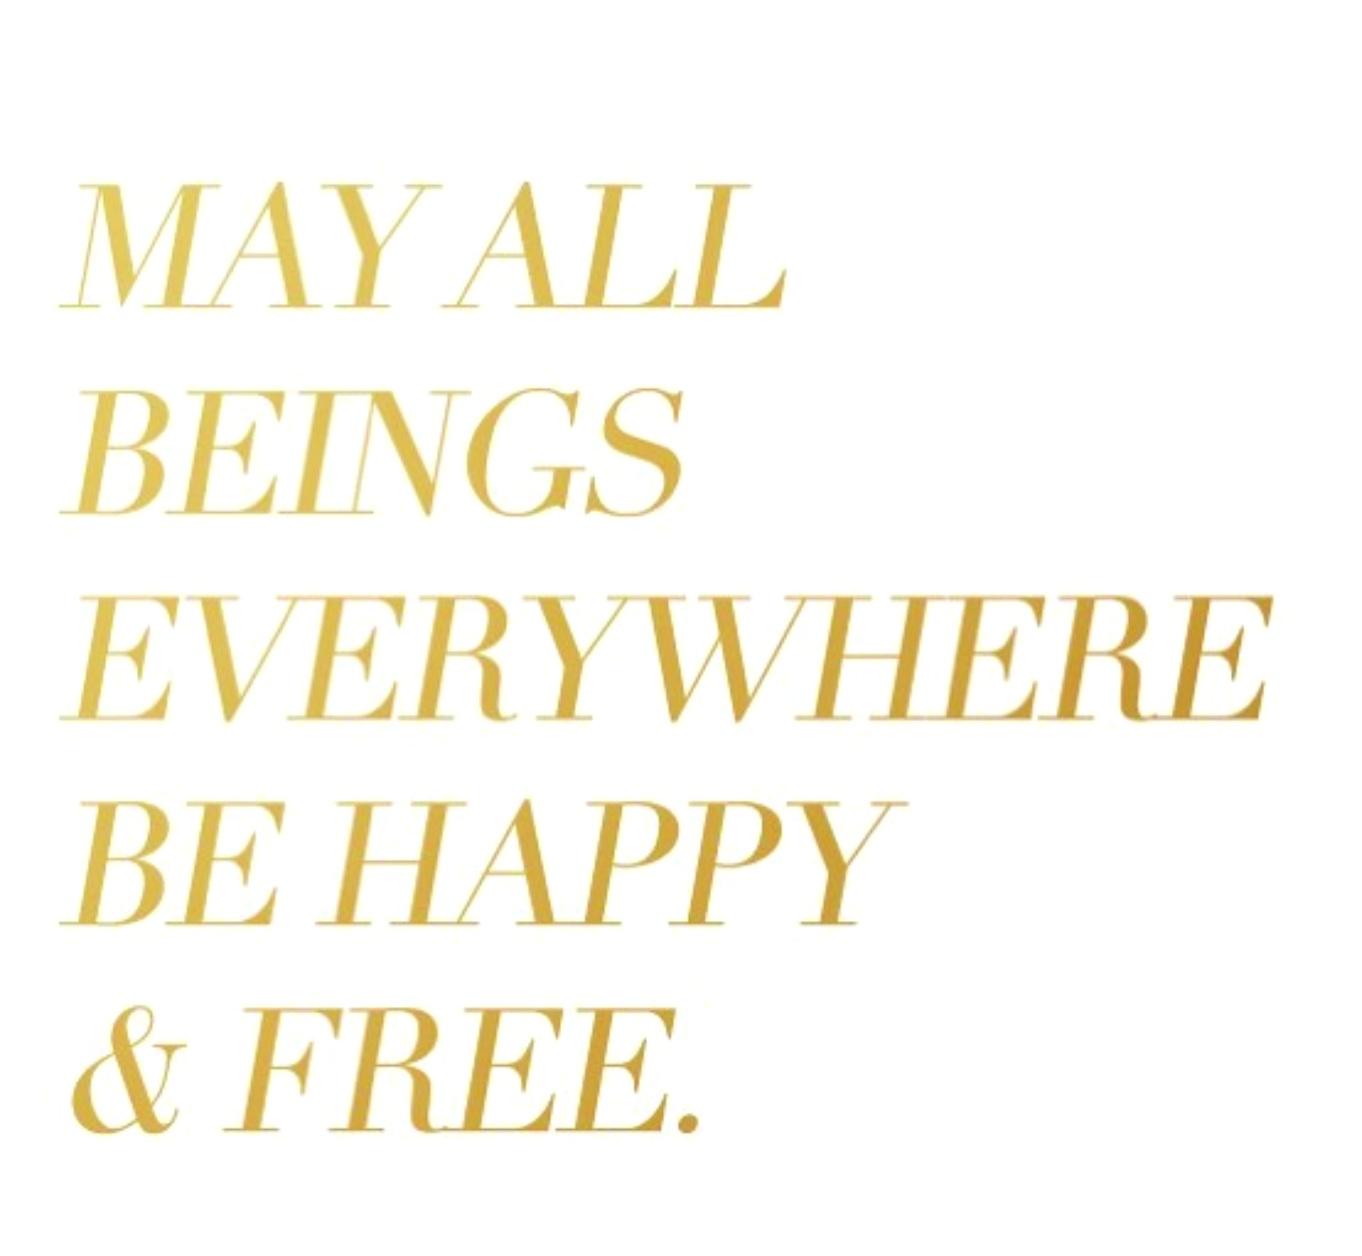 everybody+be+free.jpg